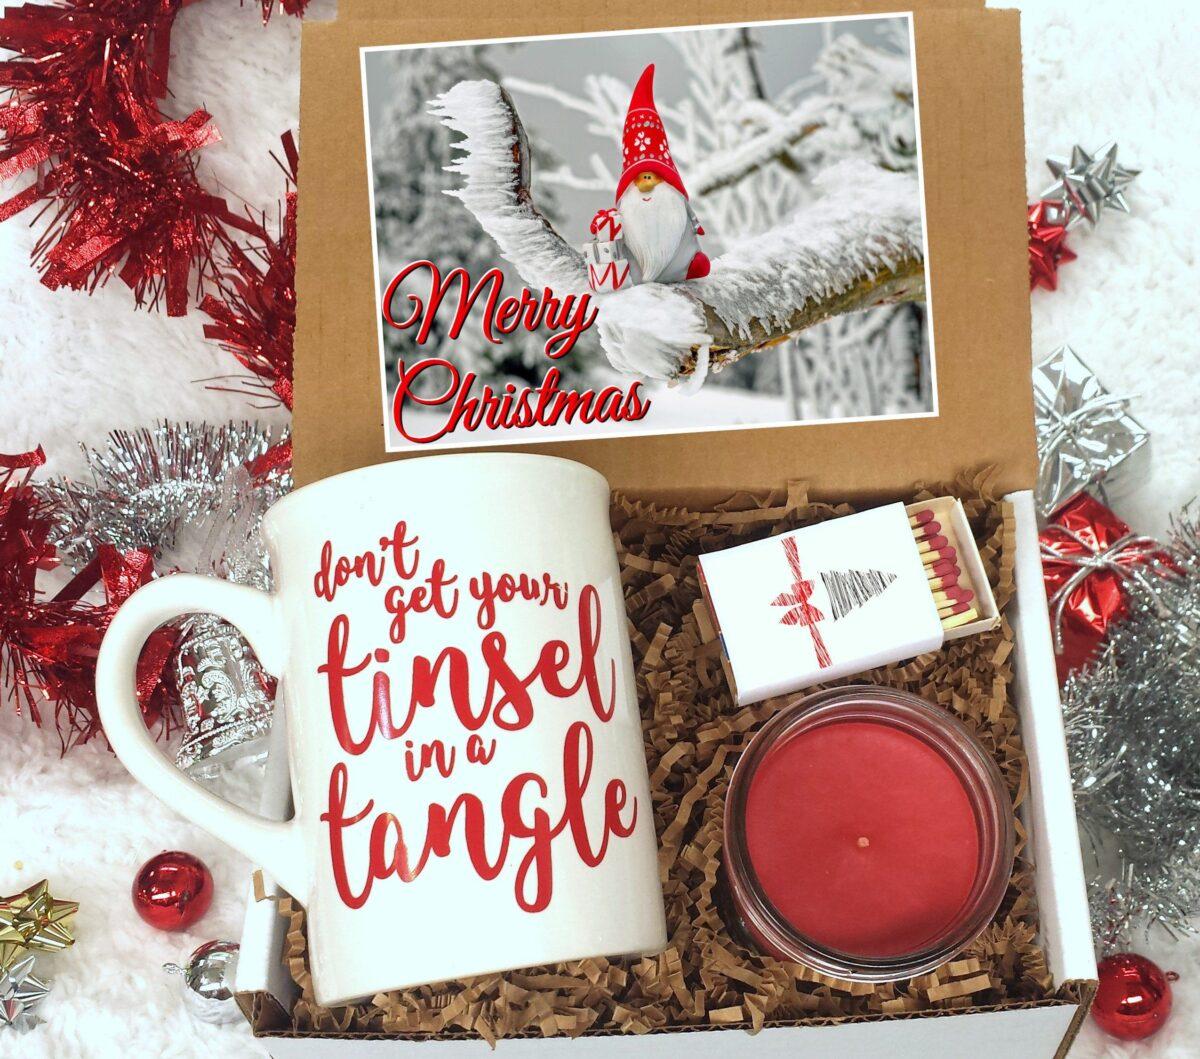 10-idee-regalo-natalizie-a-10-euro-35